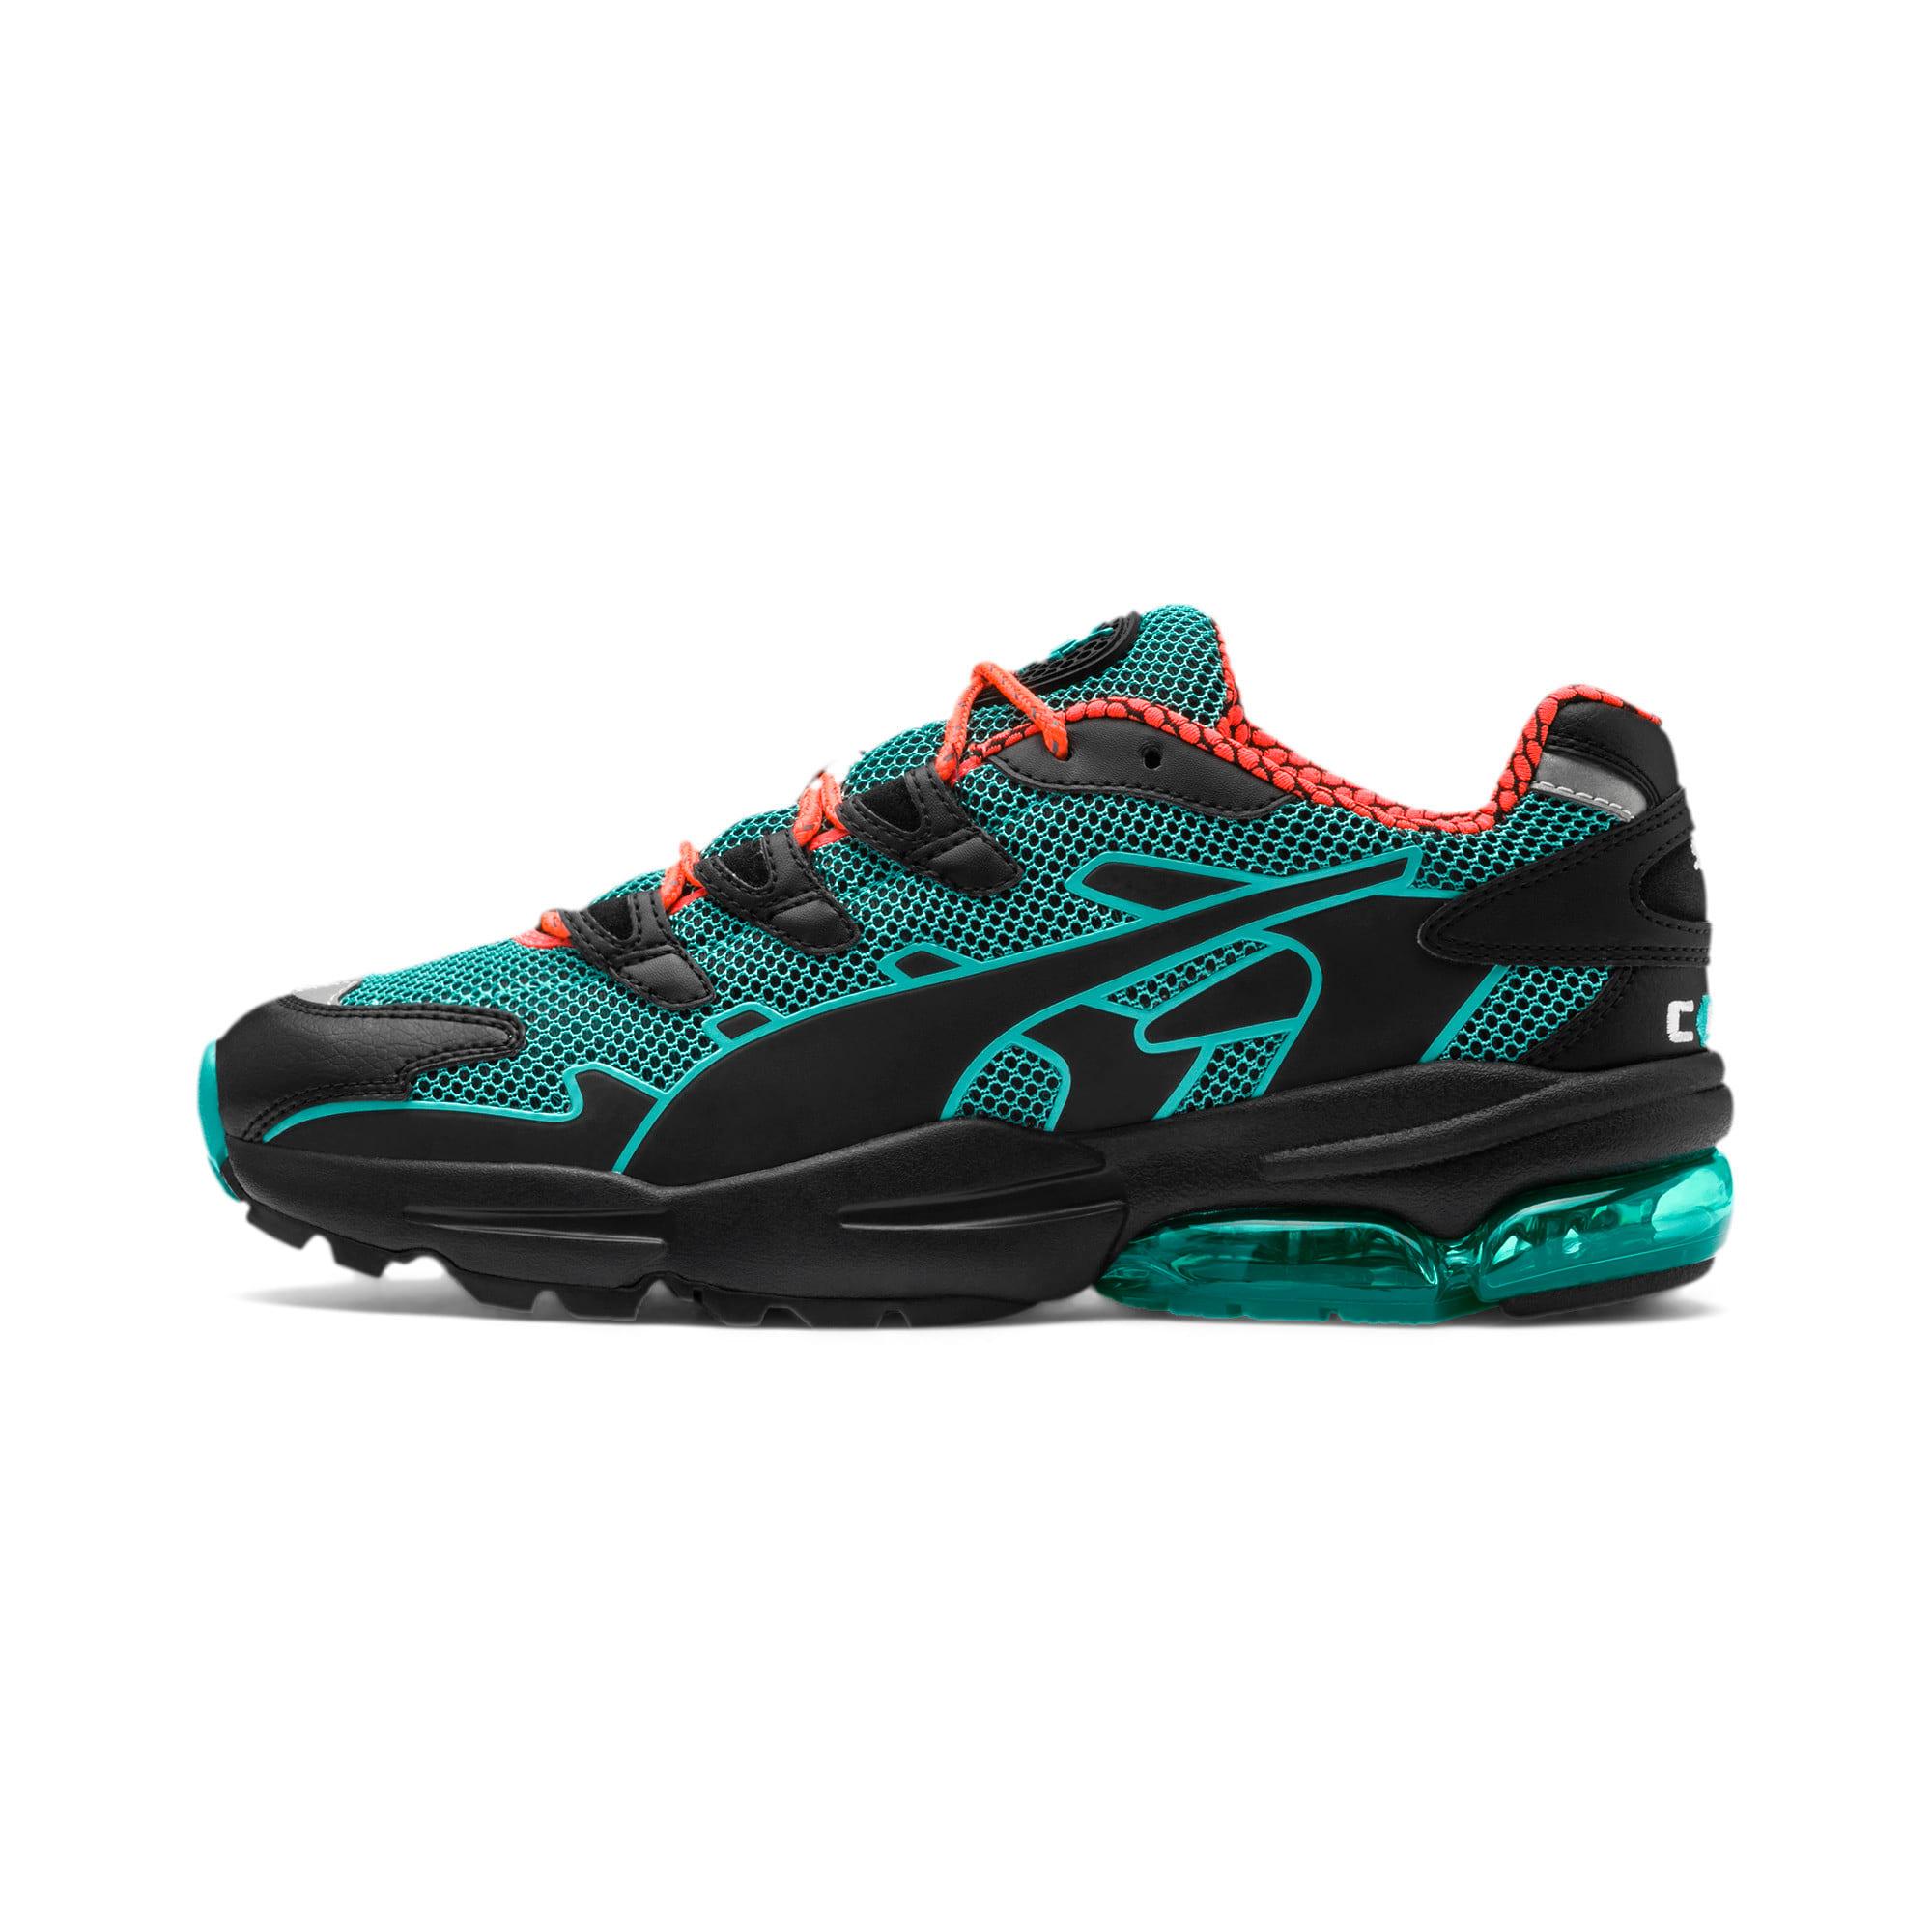 Thumbnail 1 of CELL Alien Kotto Sneakers, Puma Black-Blue Turquoise, medium